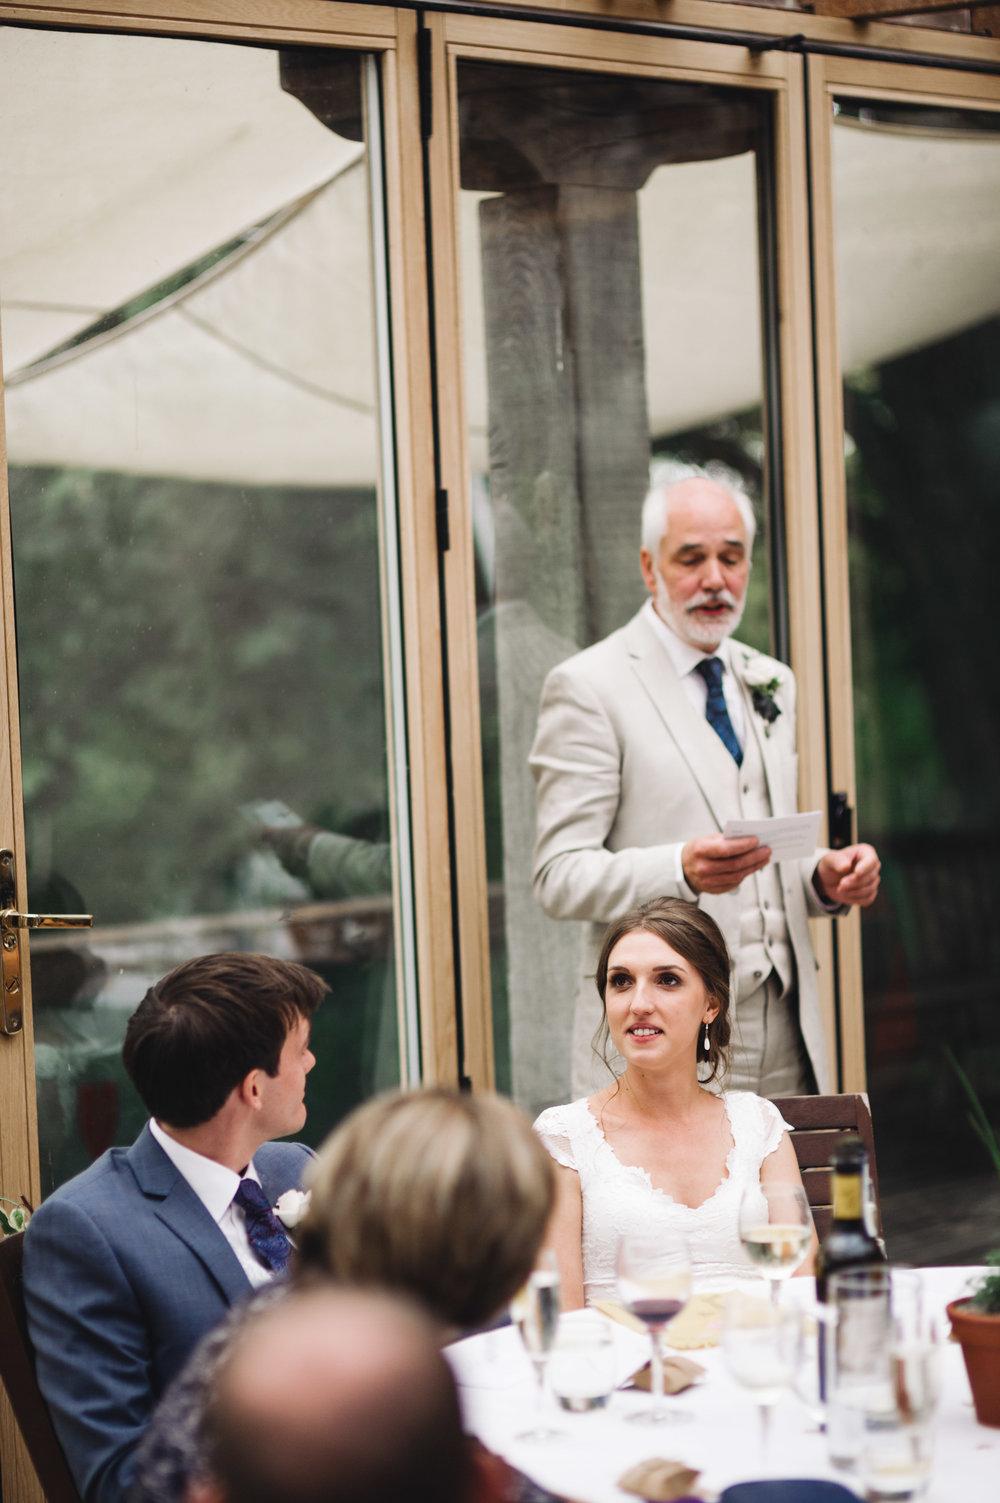 WIltshire weddings - Rachel and Chris (124 of 175).jpg